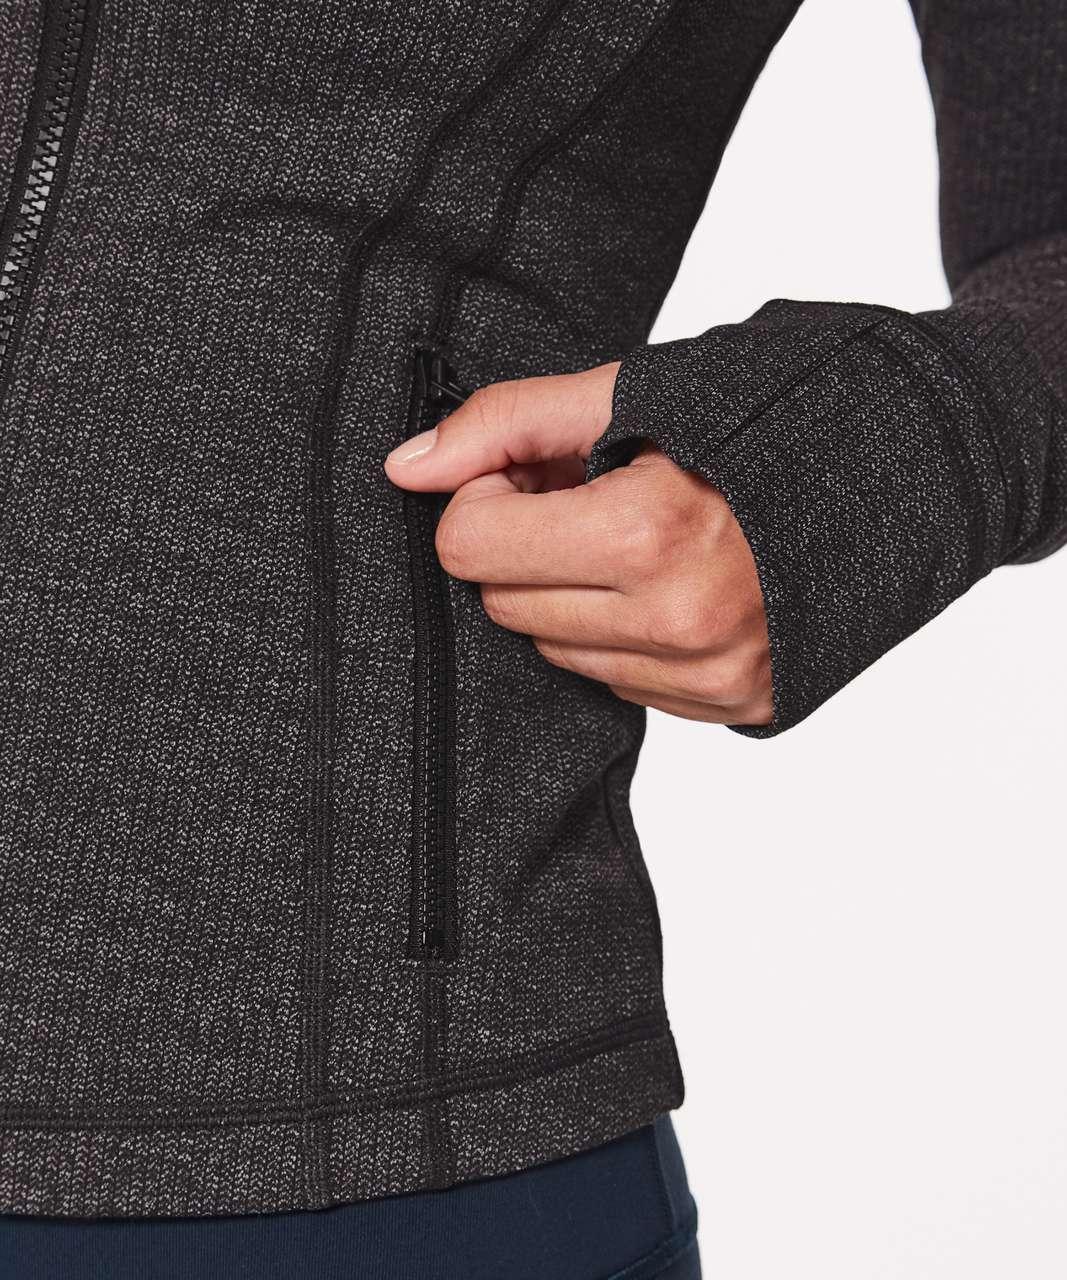 Lululemon Define Jacket - Luon Variegated Knit Black Heathered Black (First Release)